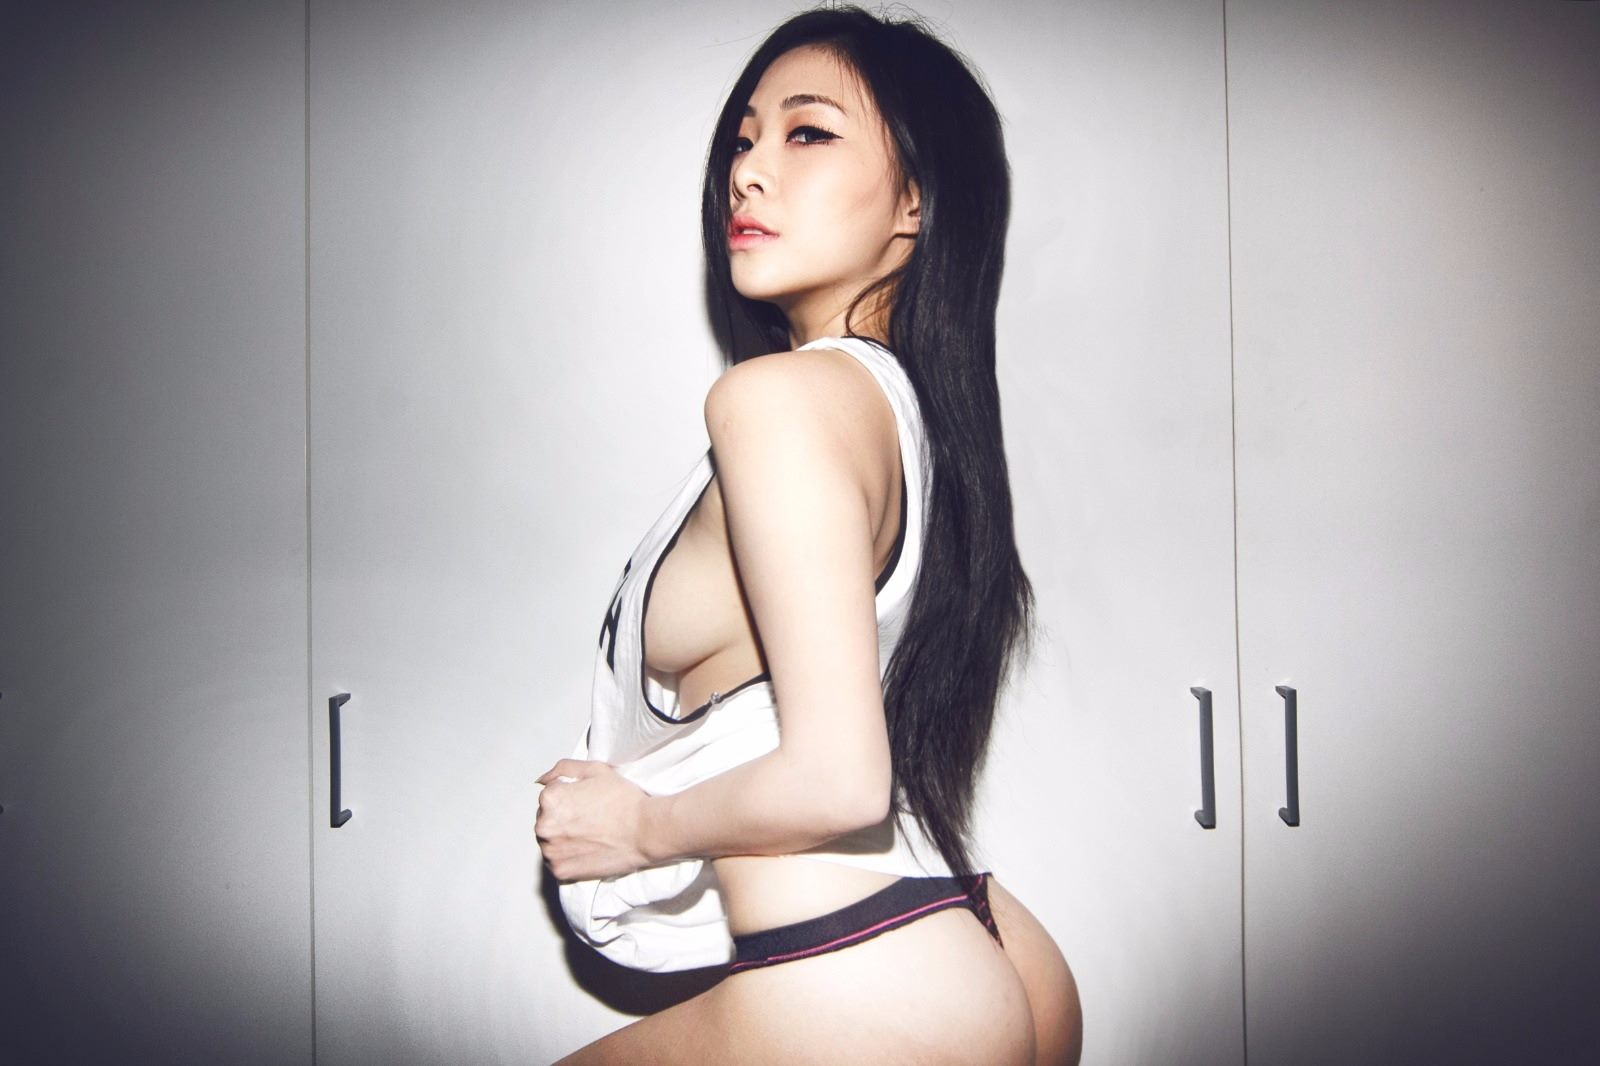 alexis grace naked